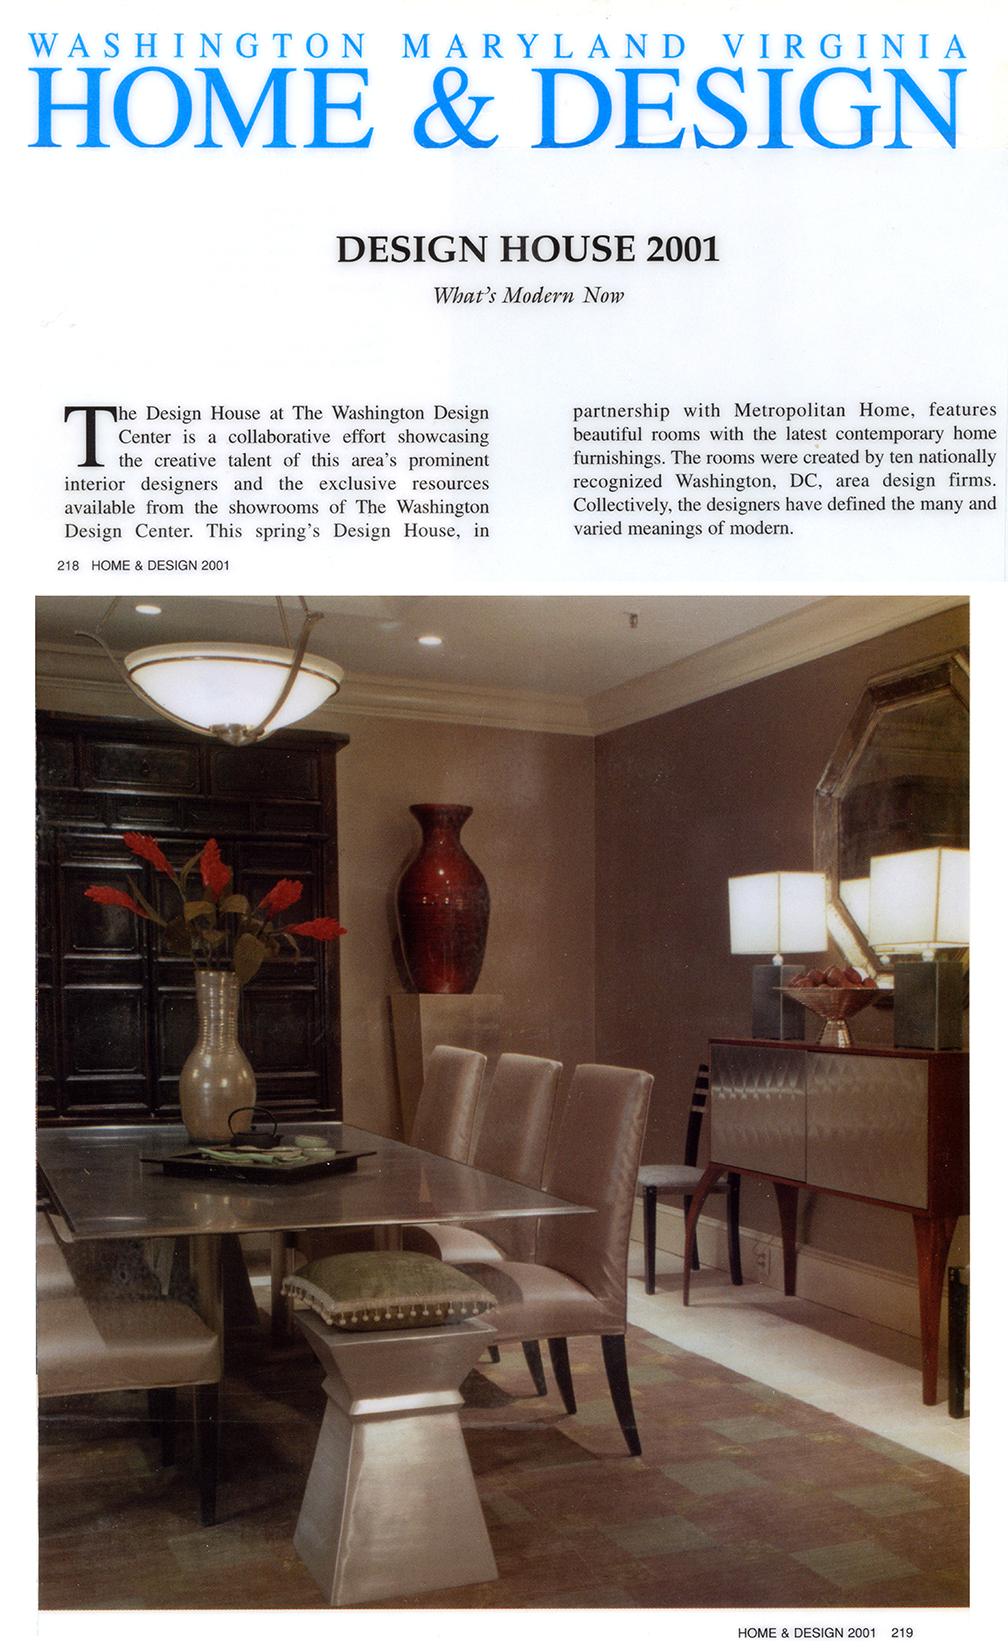 Washington Maryland Virginia Home & Design